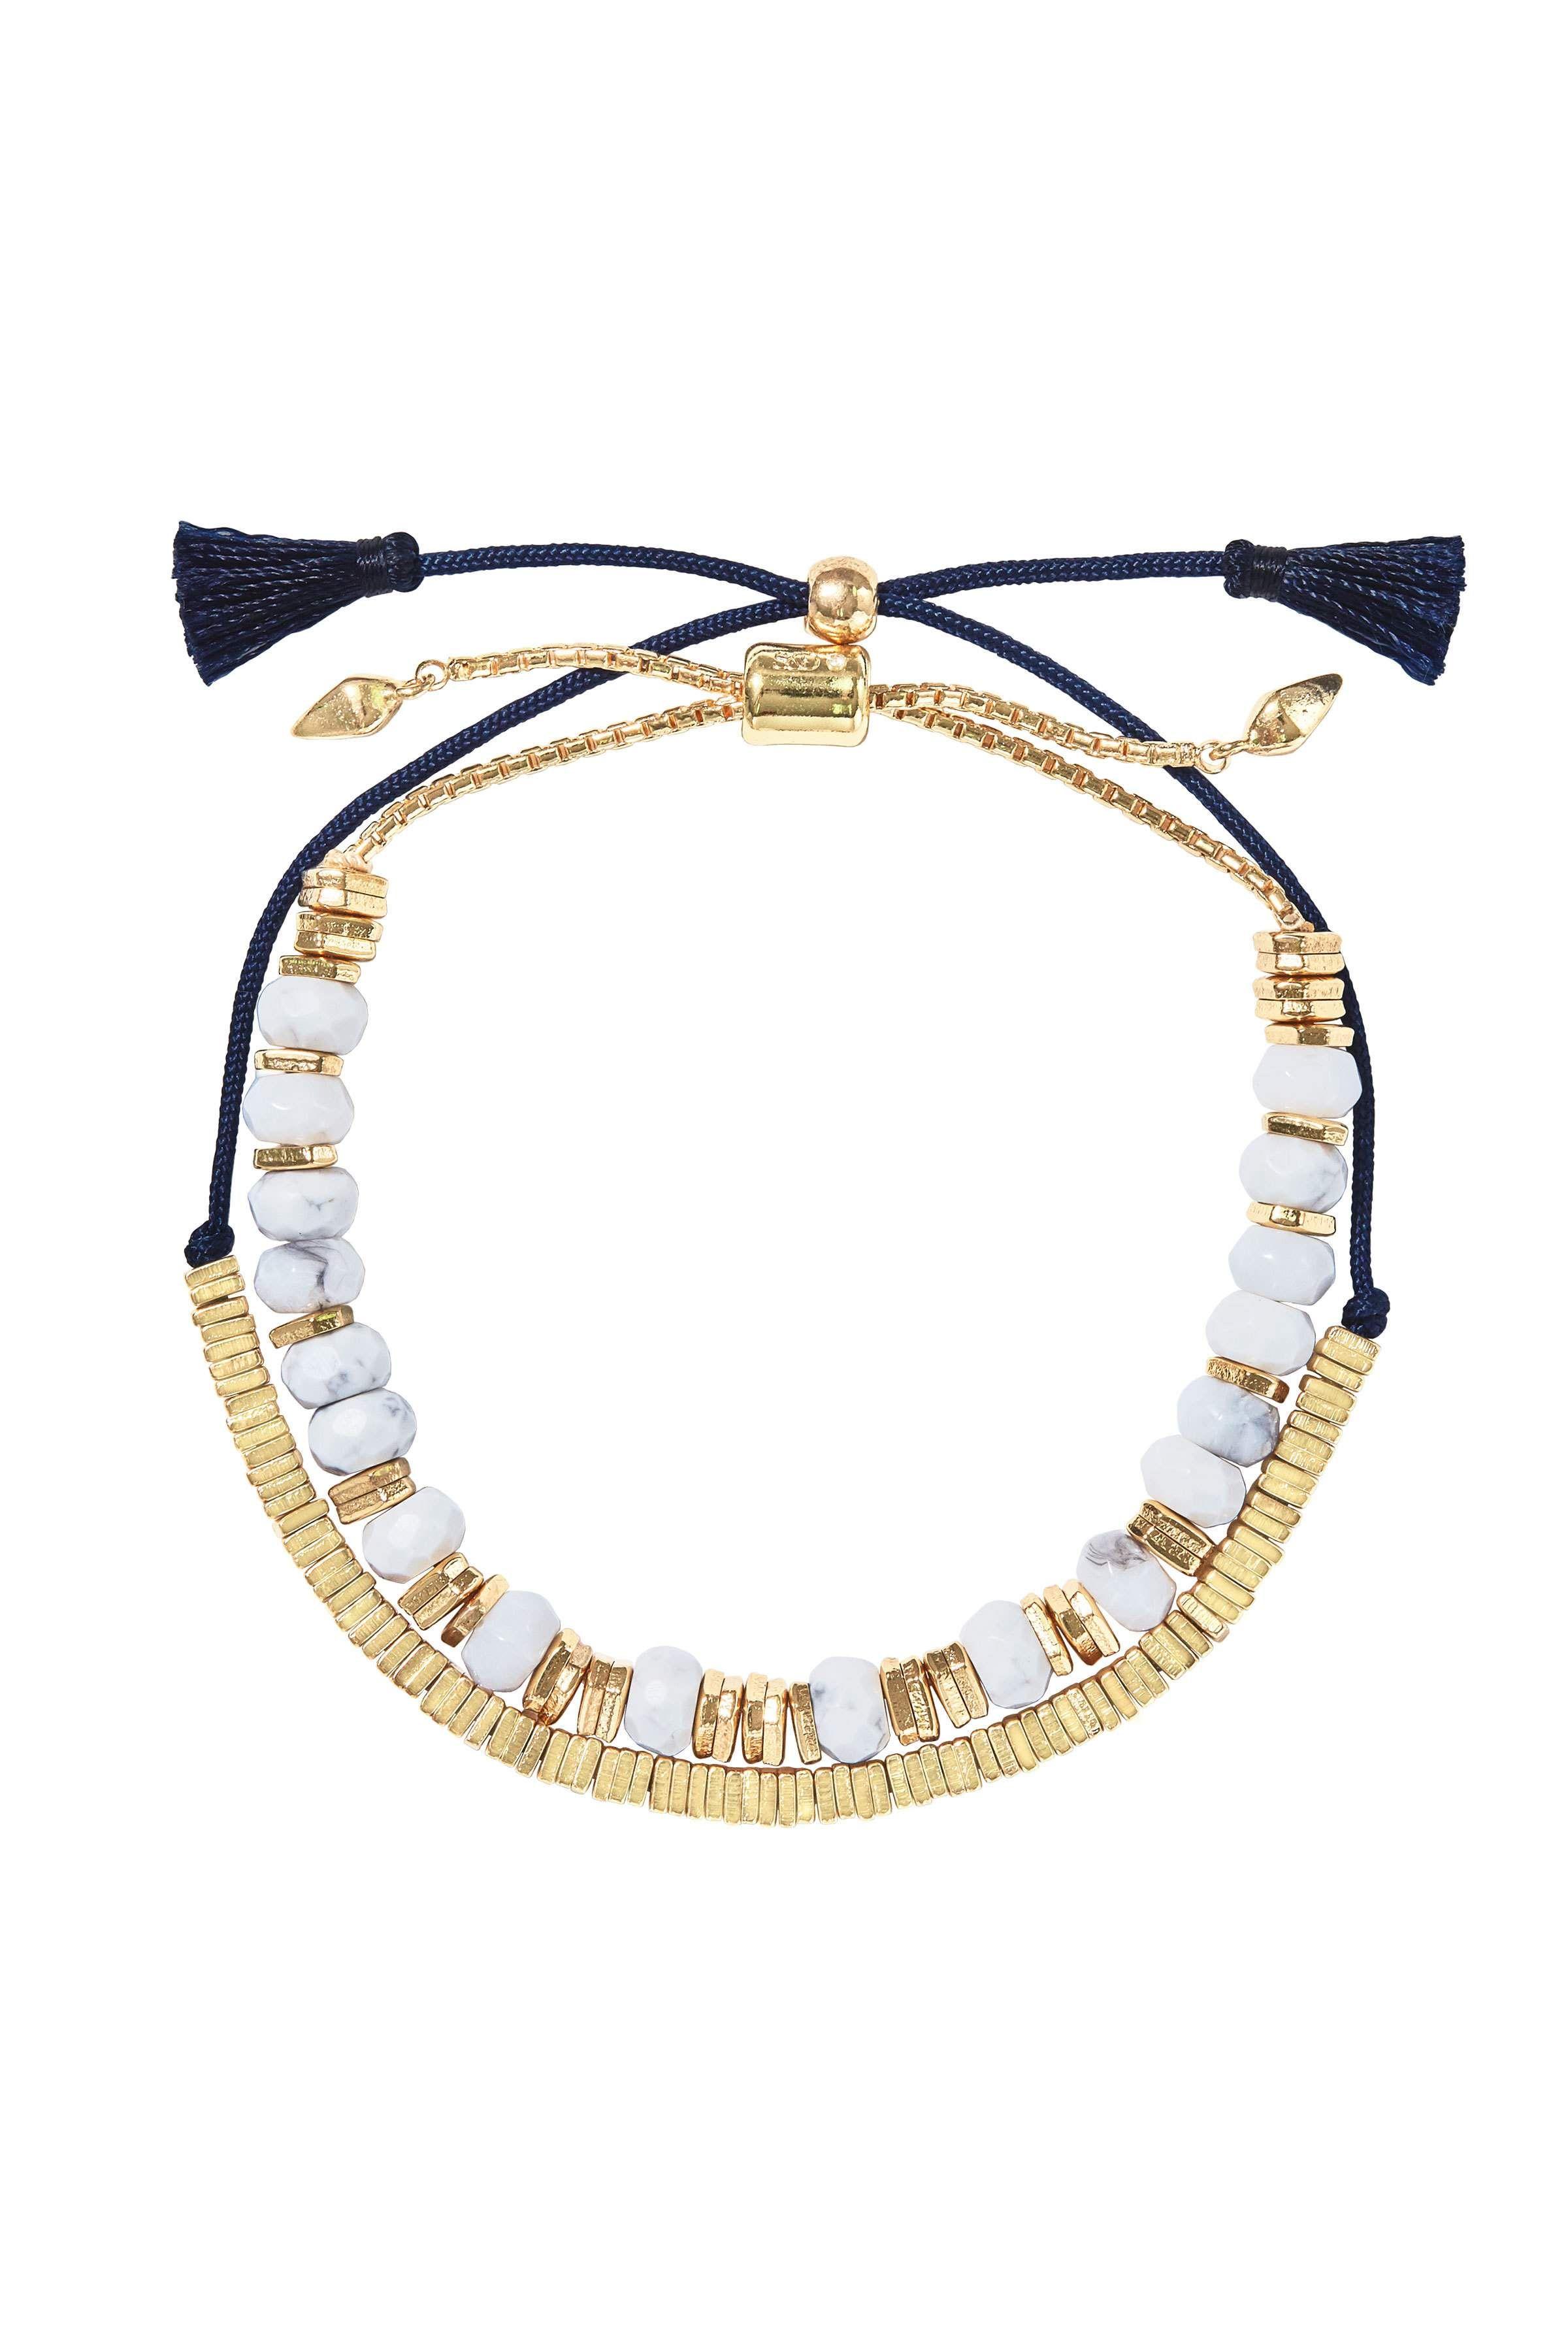 Anda Intention Wishing Bracelet Gift Ideas Pinterest Bracelets